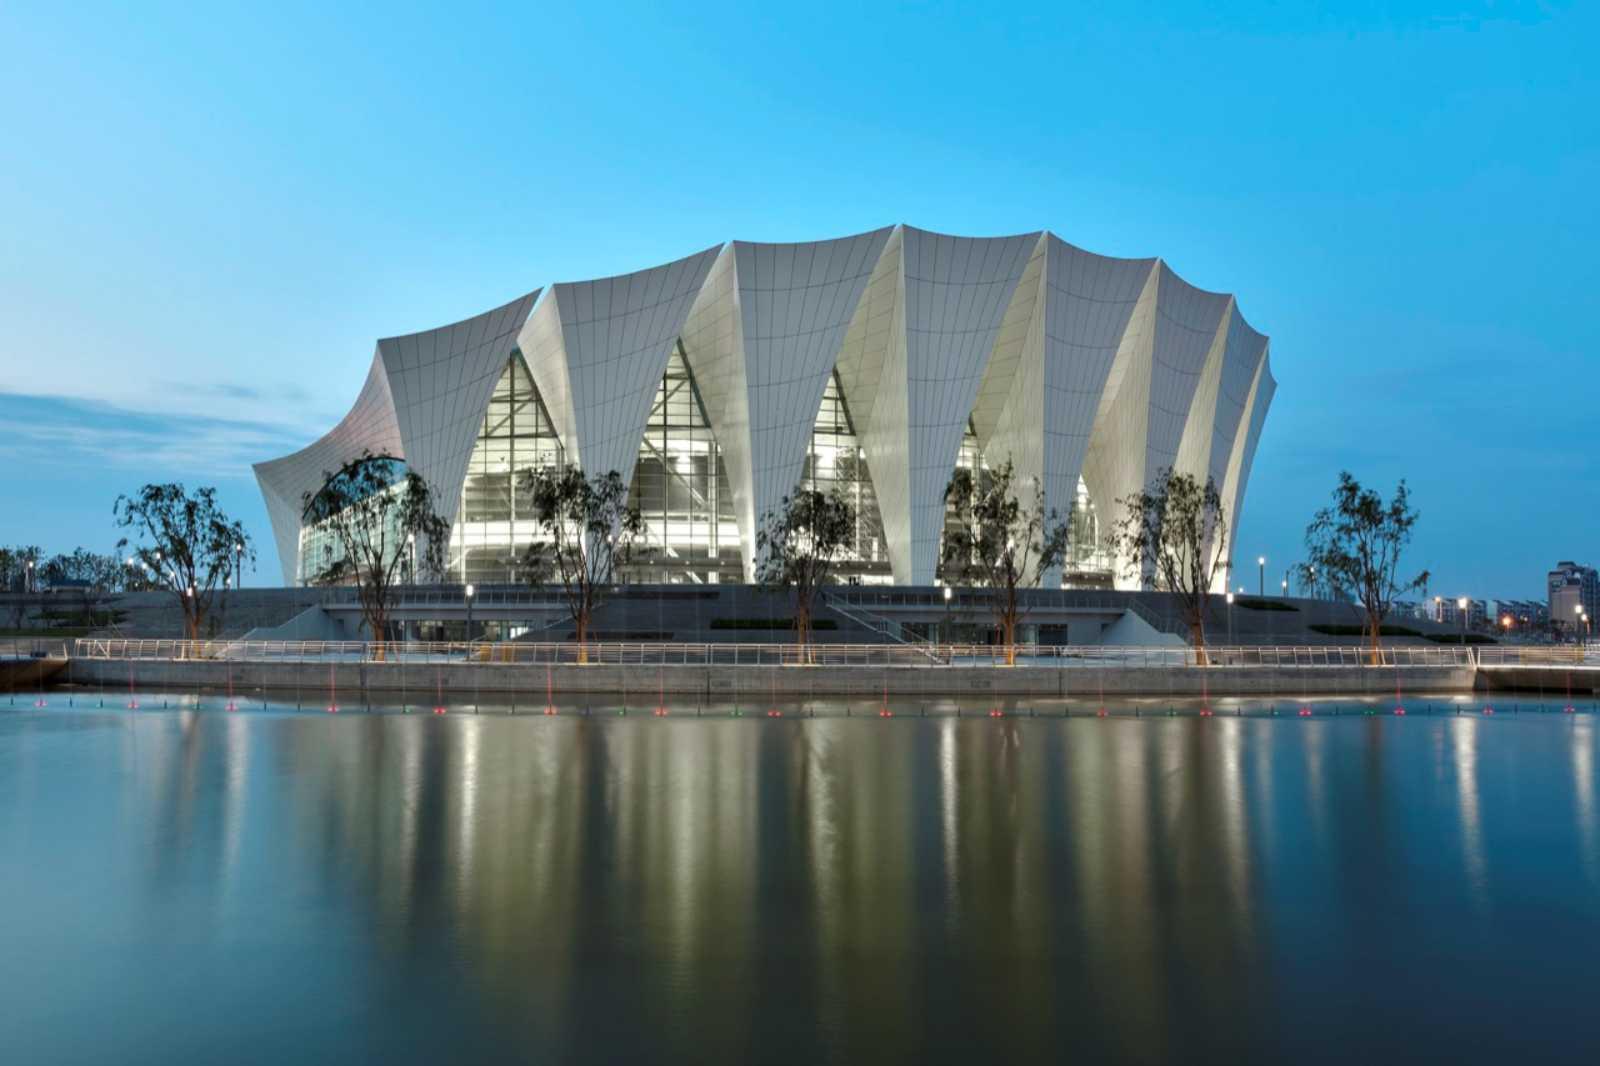 Shanghai oriental sports center by gmp architekten a as - Gmp architektur ...